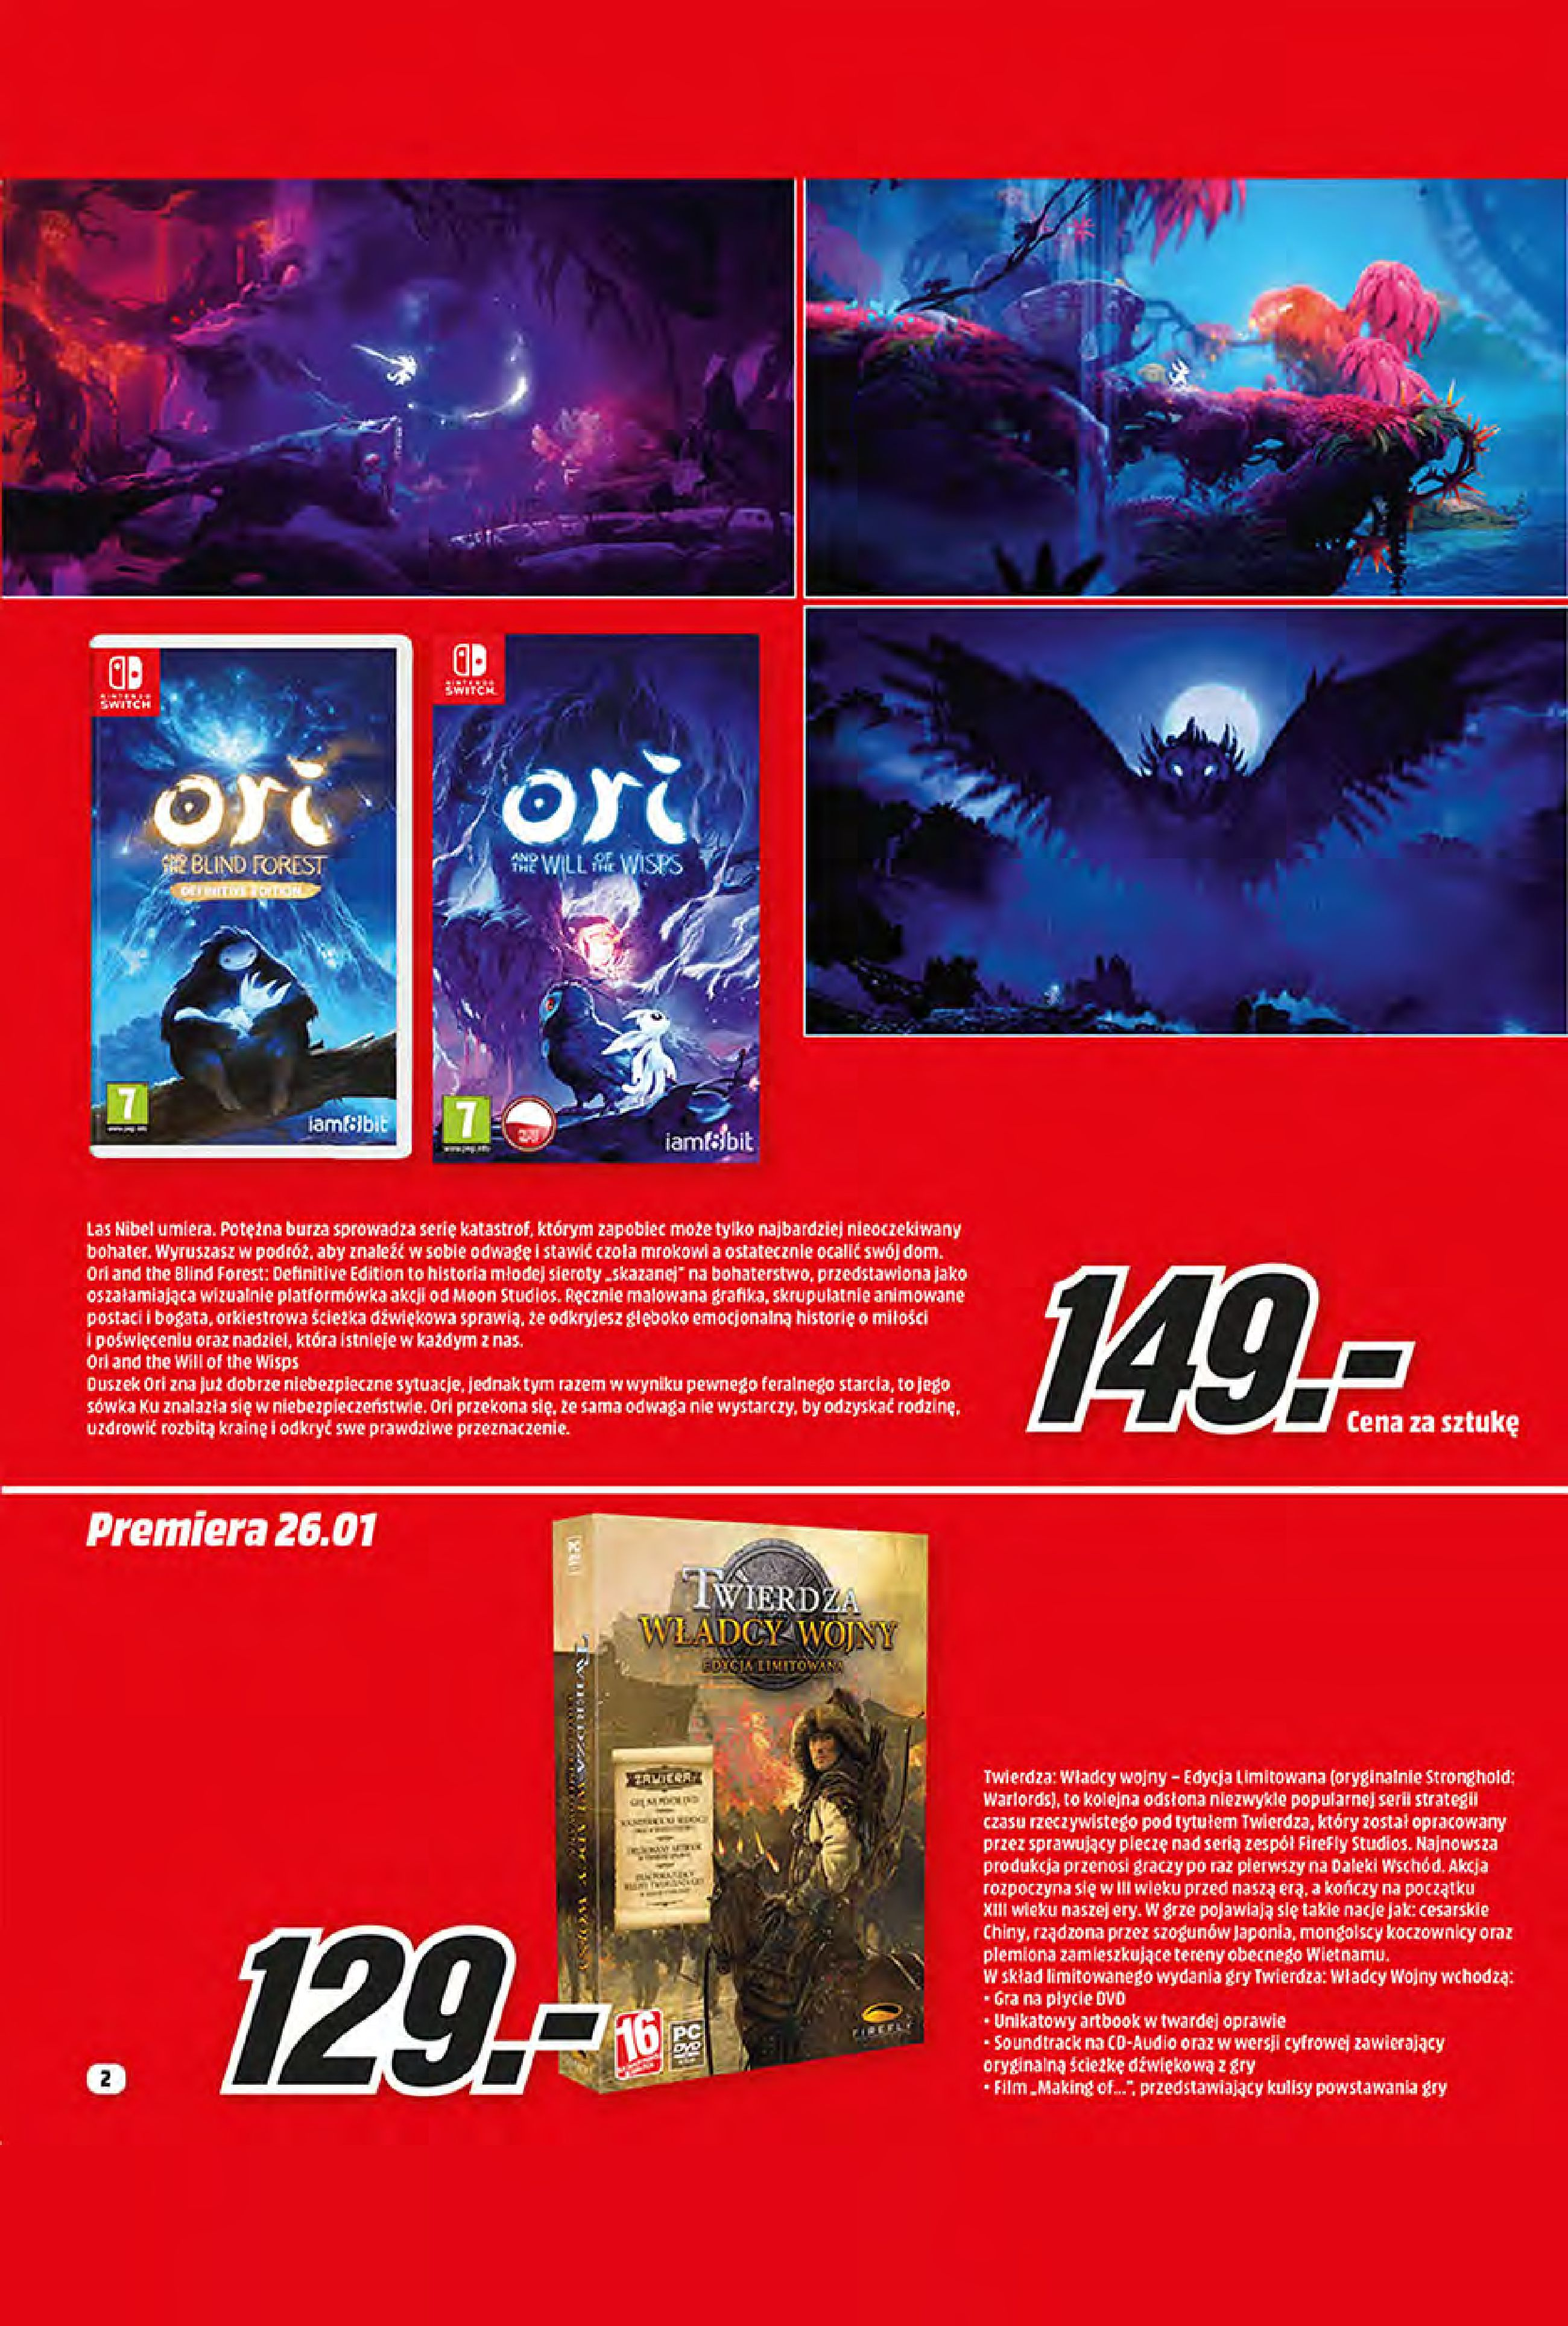 Gazetka Media Markt: Oferta handlowa 2021-01-11 page-2